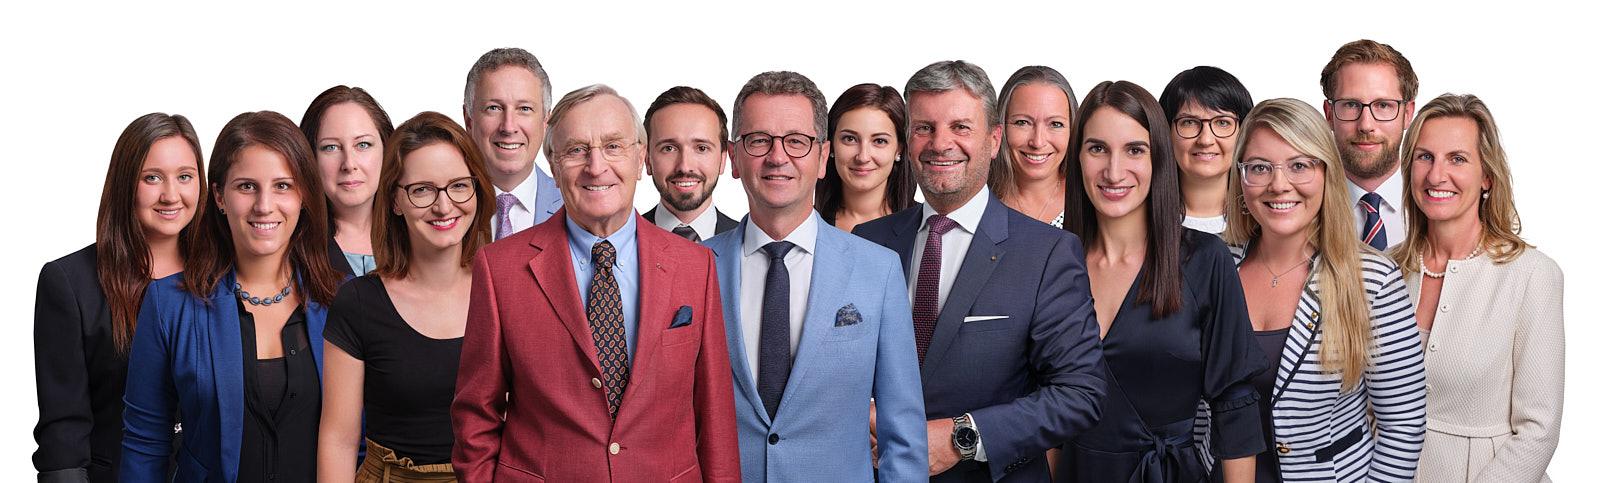 Das Hölzl & Hubner Team